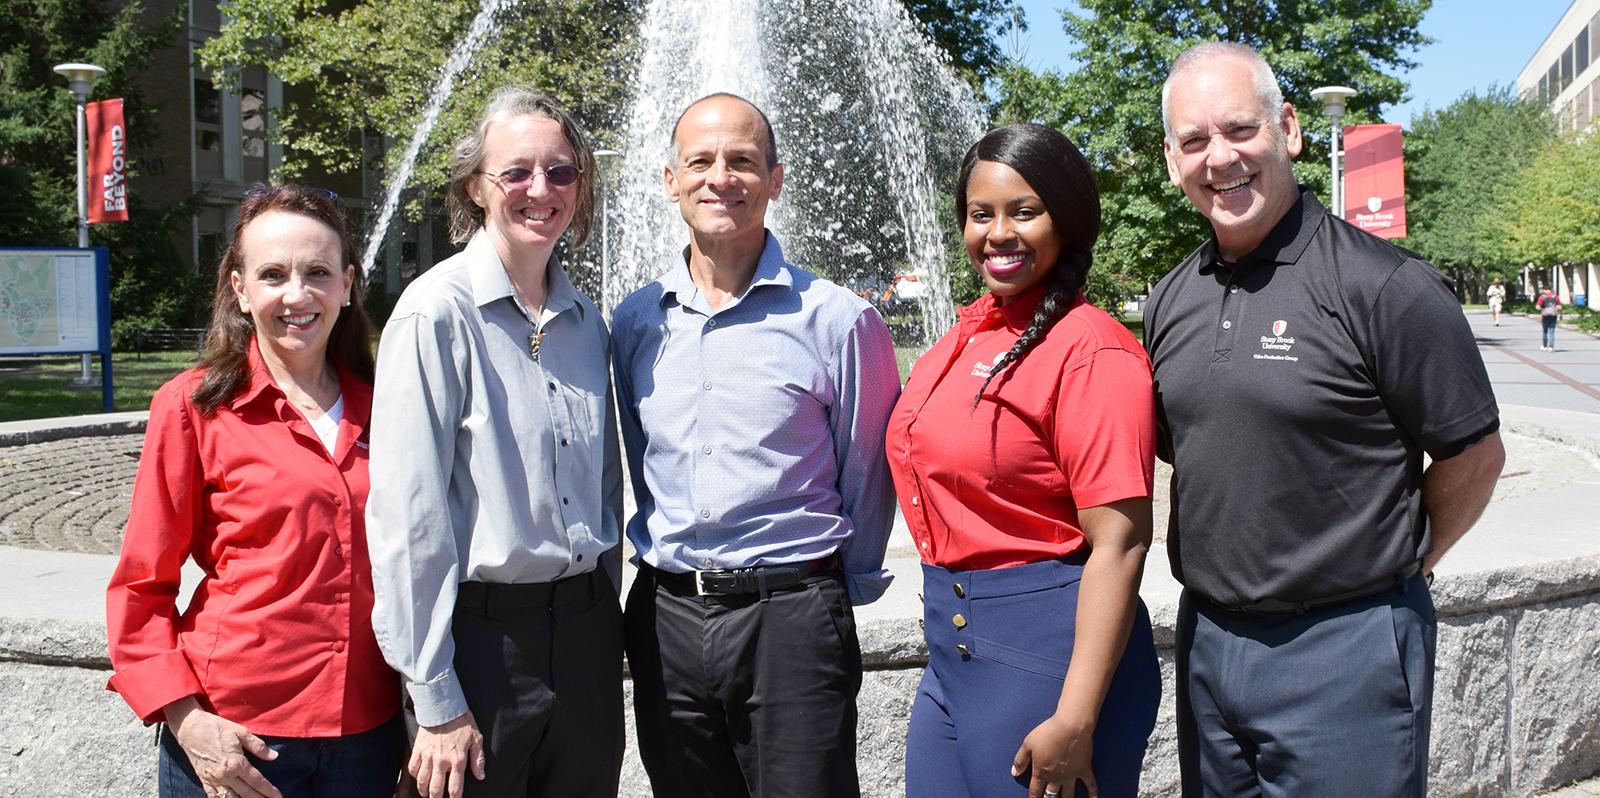 From left to right: Linda Unger, Jennifer Adams, Dr. Peter Small, Tayisha Saint Vil, William Cusick.